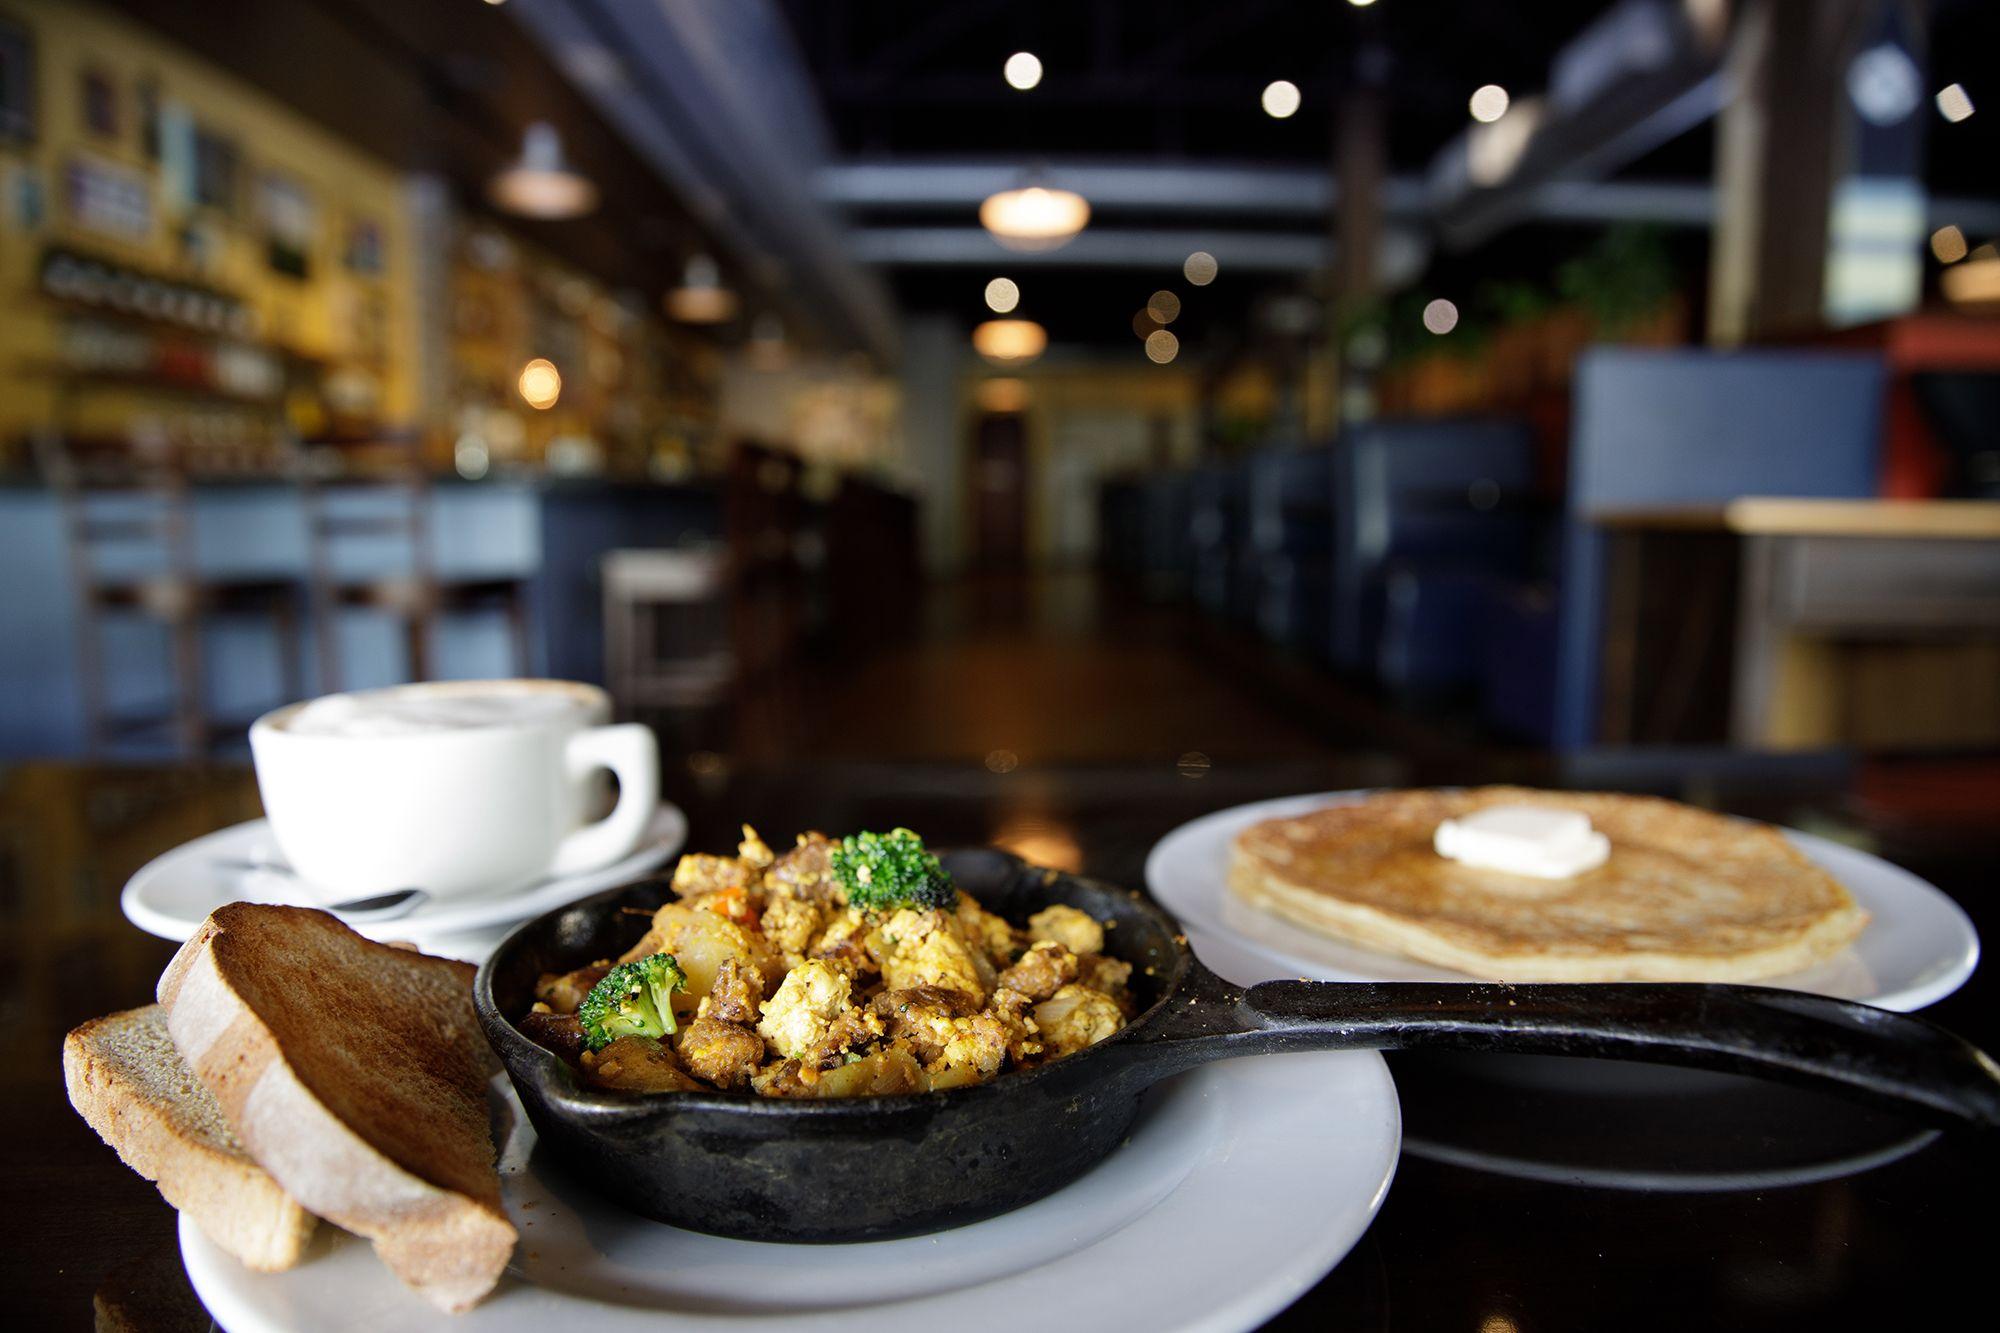 Vegan feast at local favorite Ethos